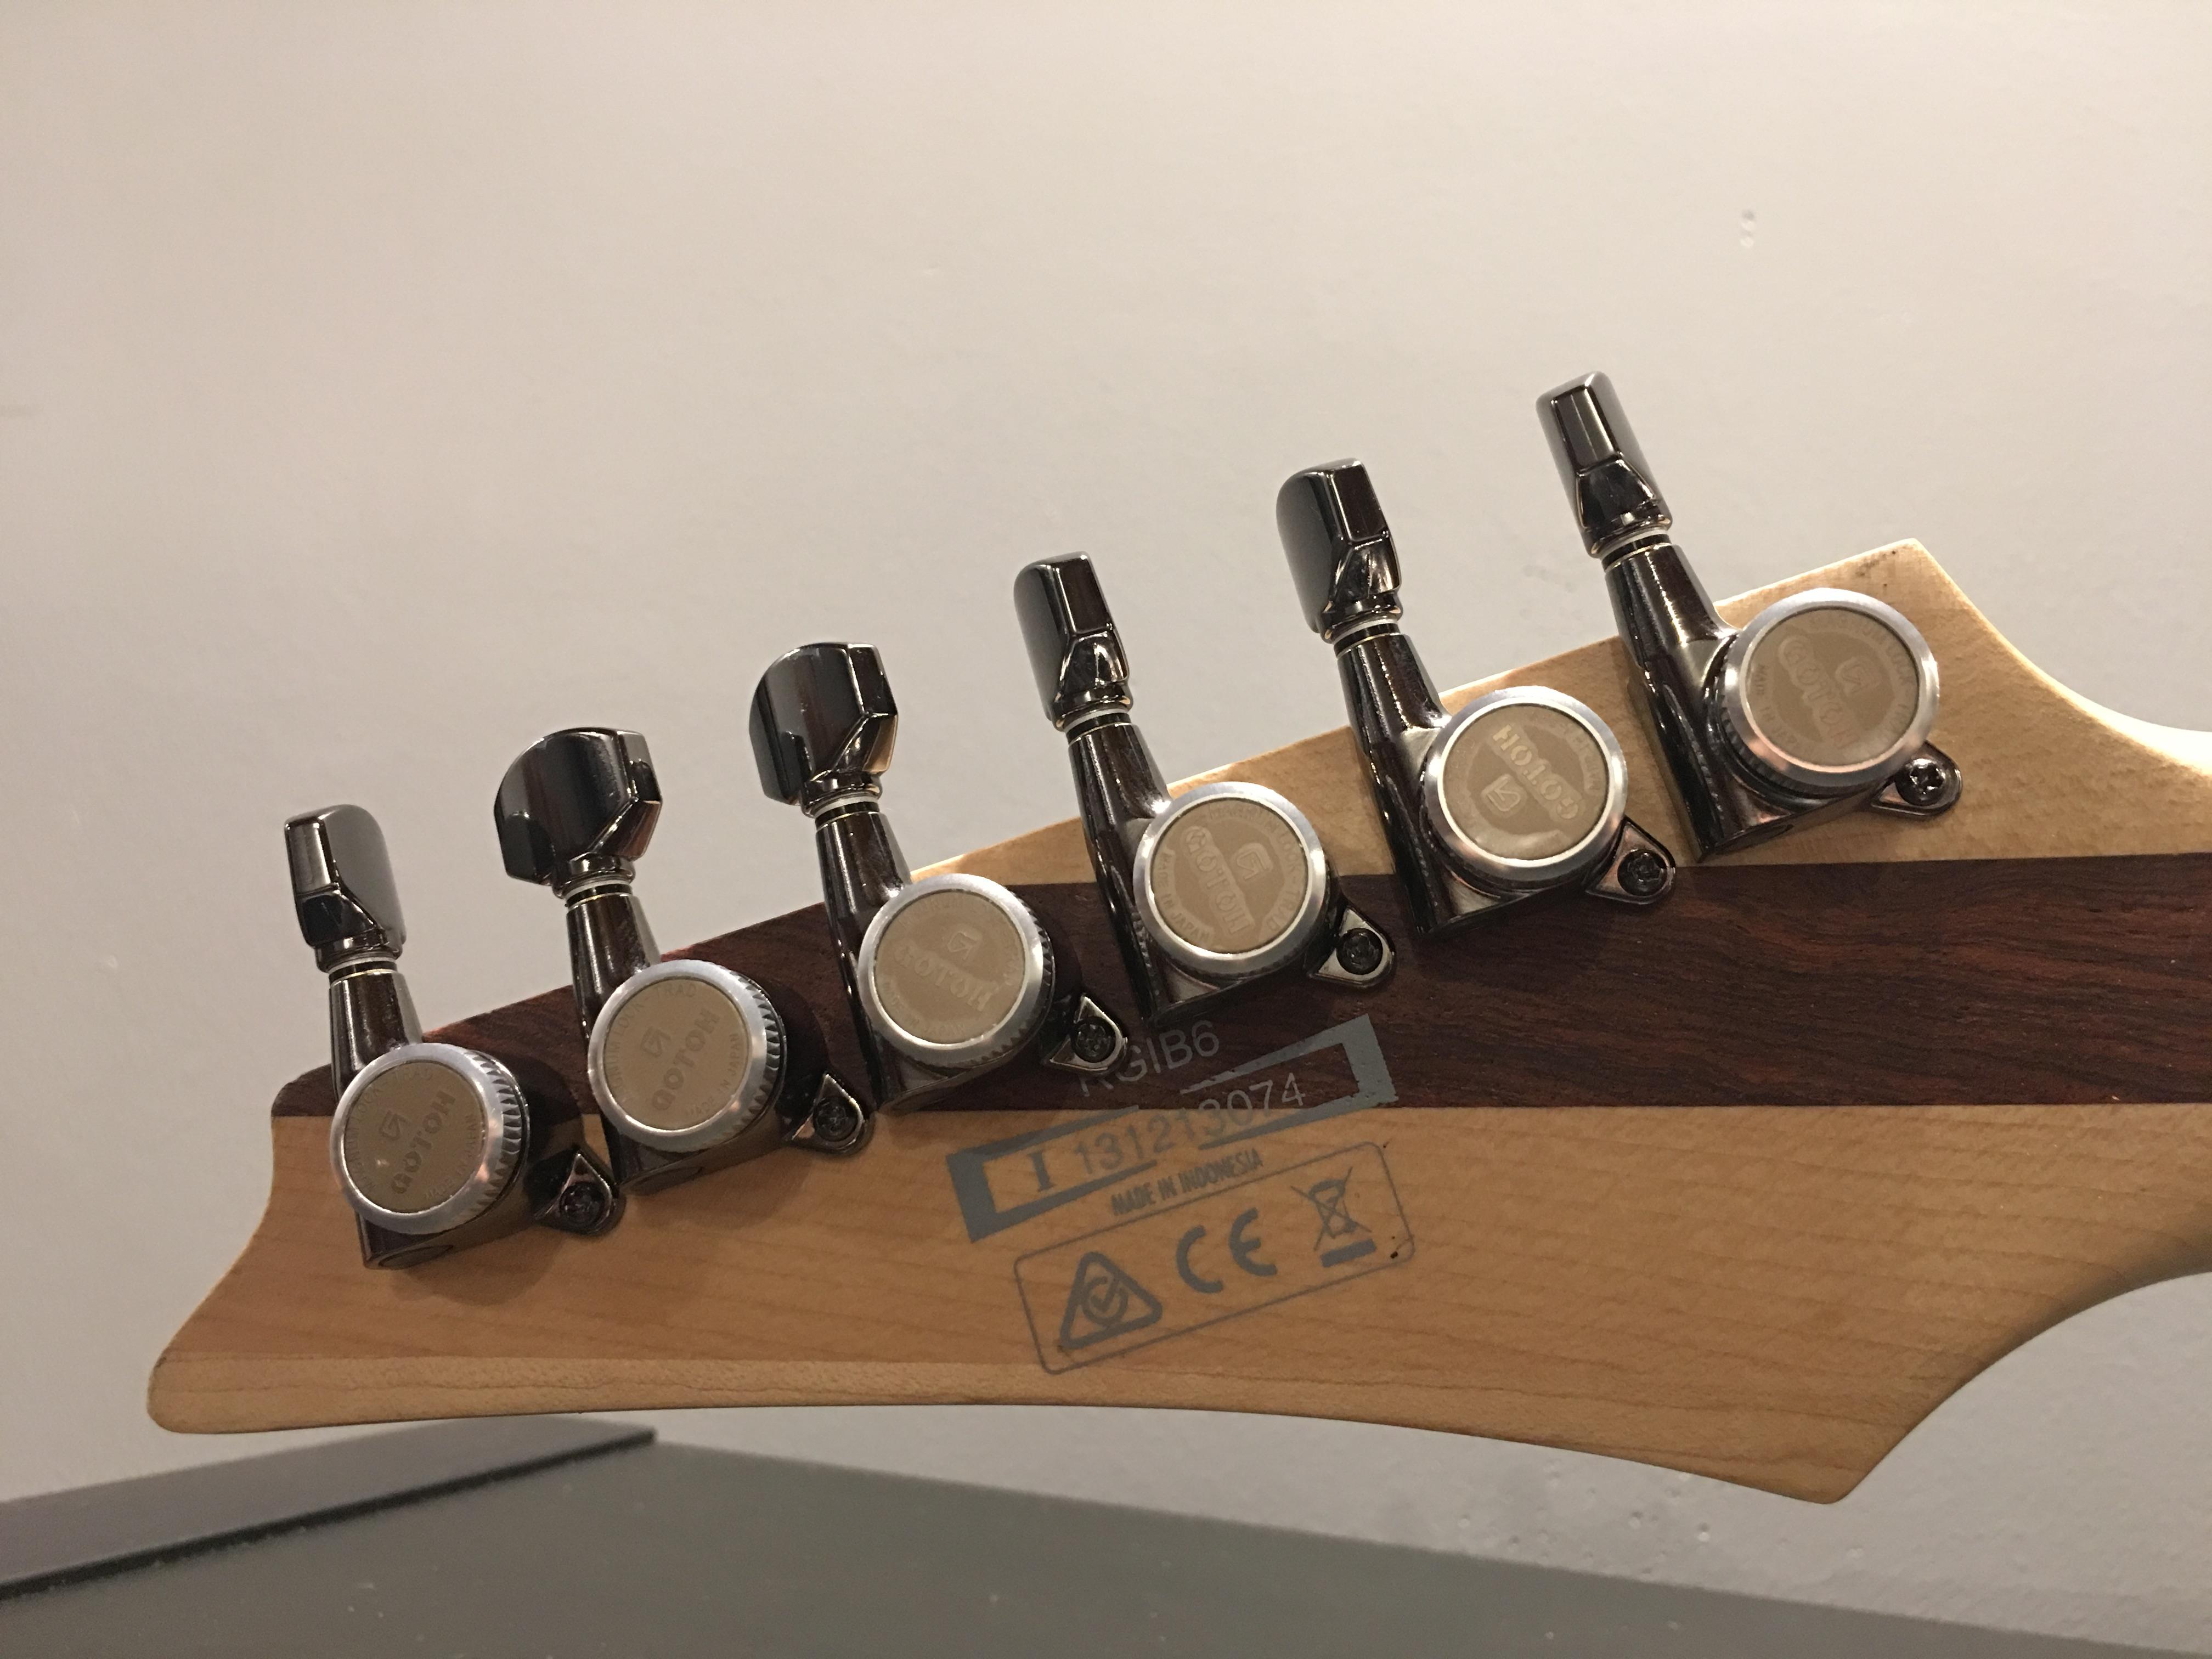 Locking Tuners for Ibanez?-img_0448-jpg